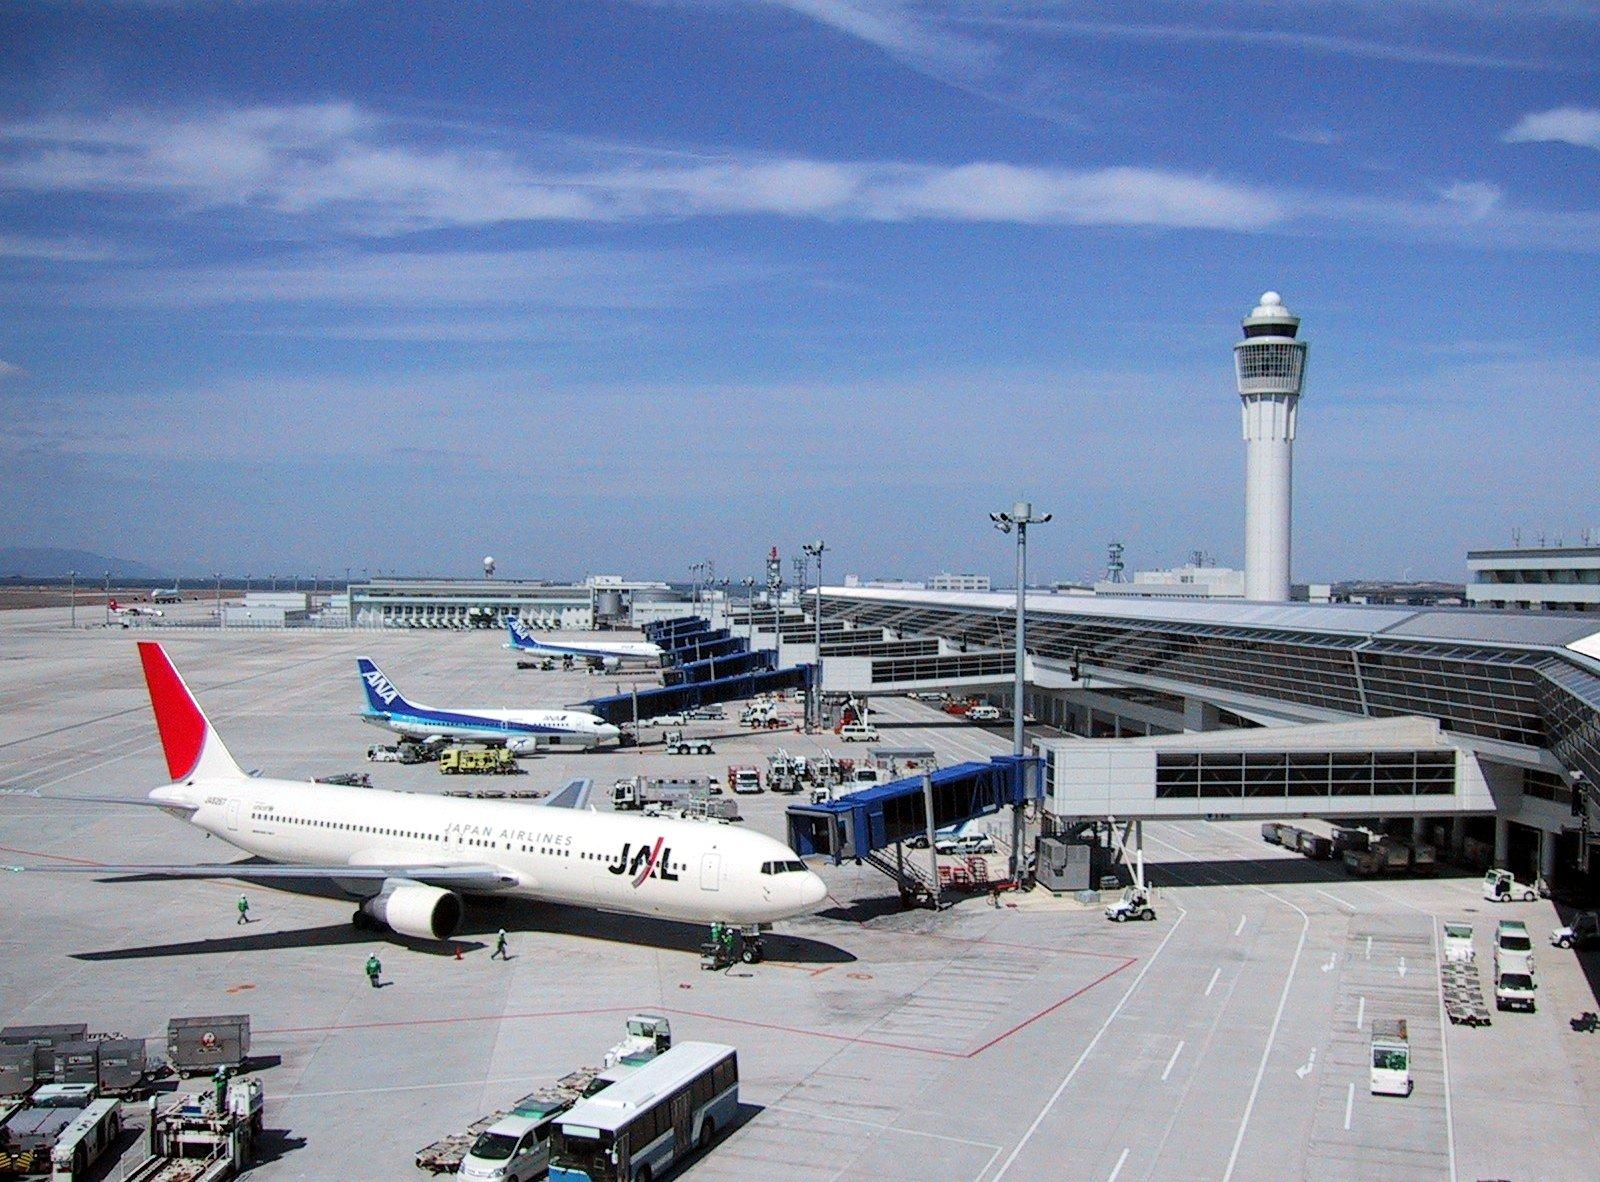 https://commons.wikimedia.org/wiki/File:Nagoya_Airport_view_from_promenade.jpg